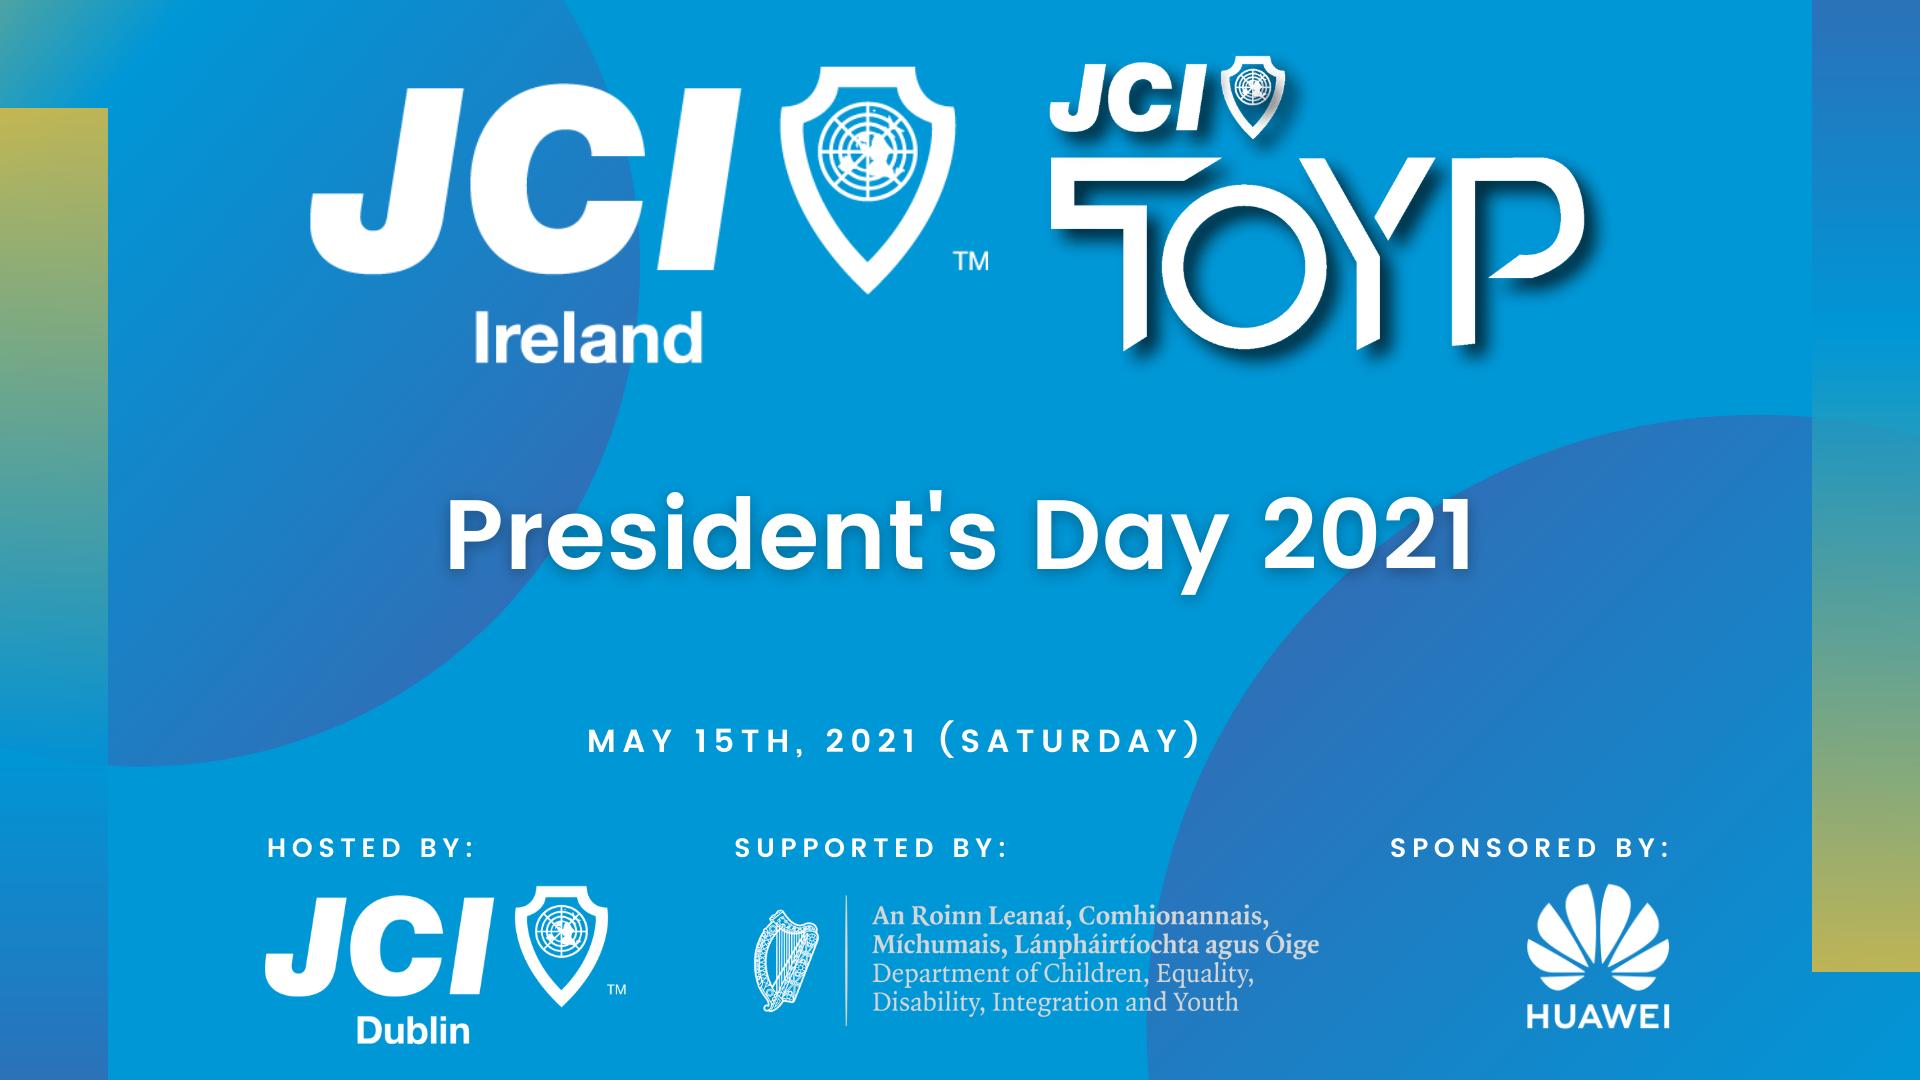 JCI Ireland President's Day 2021